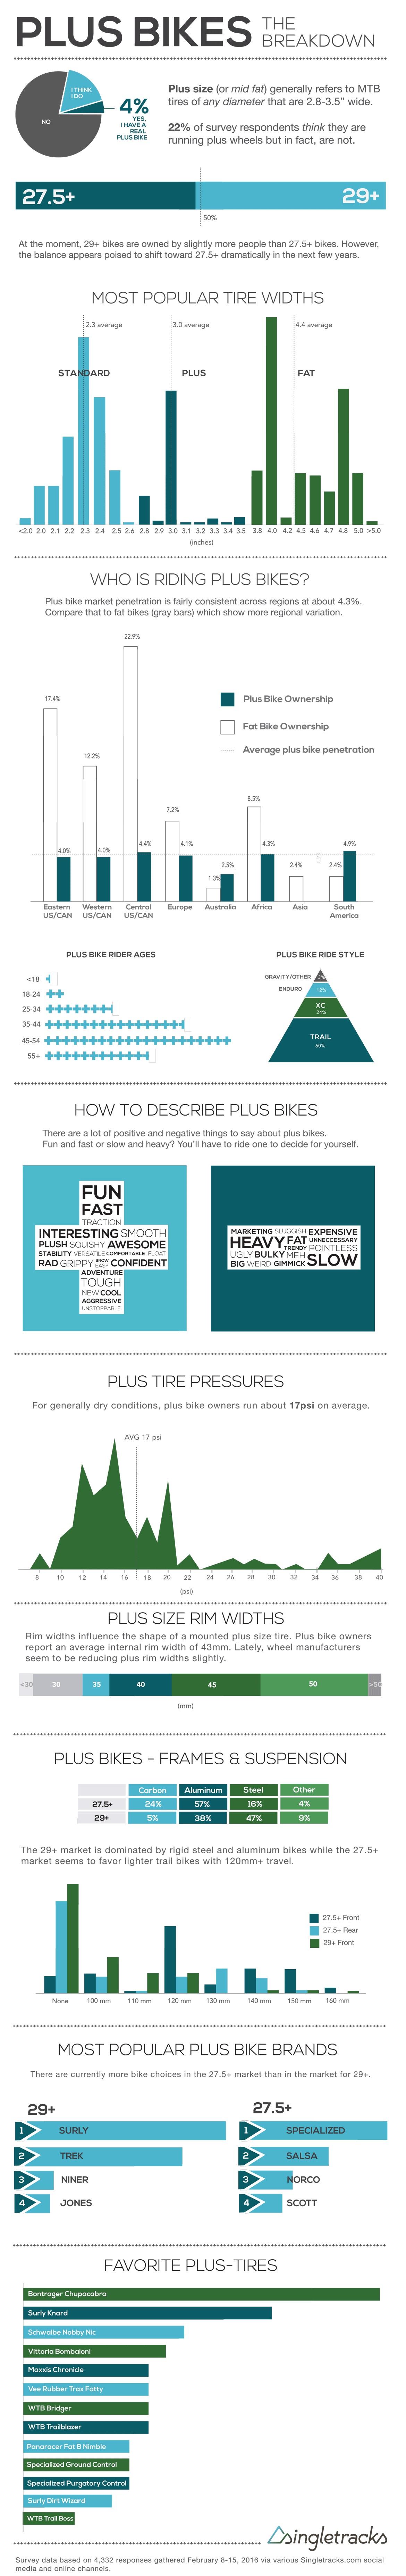 plus_bikes_infographic